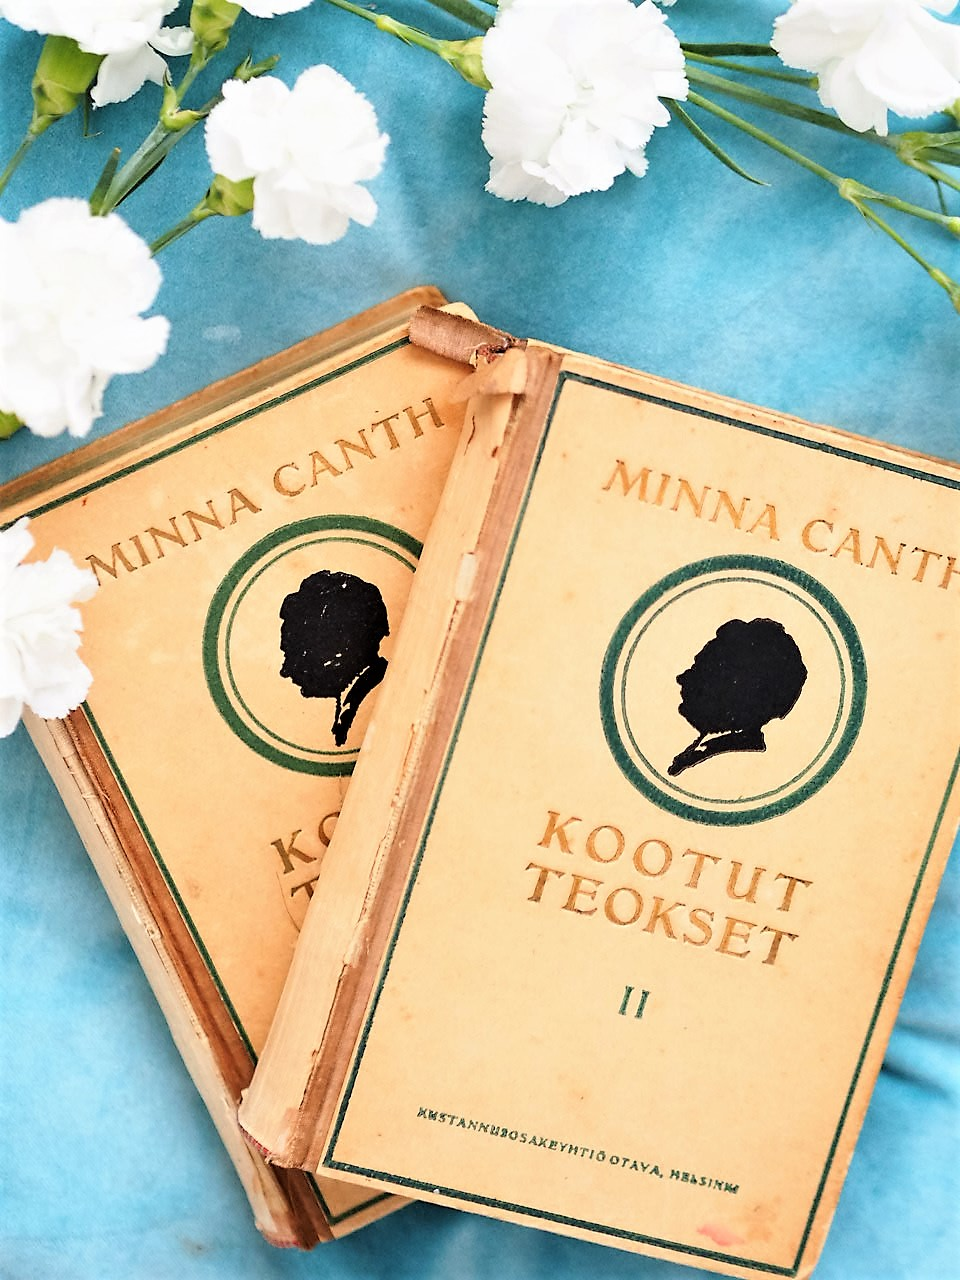 What would Minna Canth do? Eli se, mitä sinun pitäisi oppia Canthilta